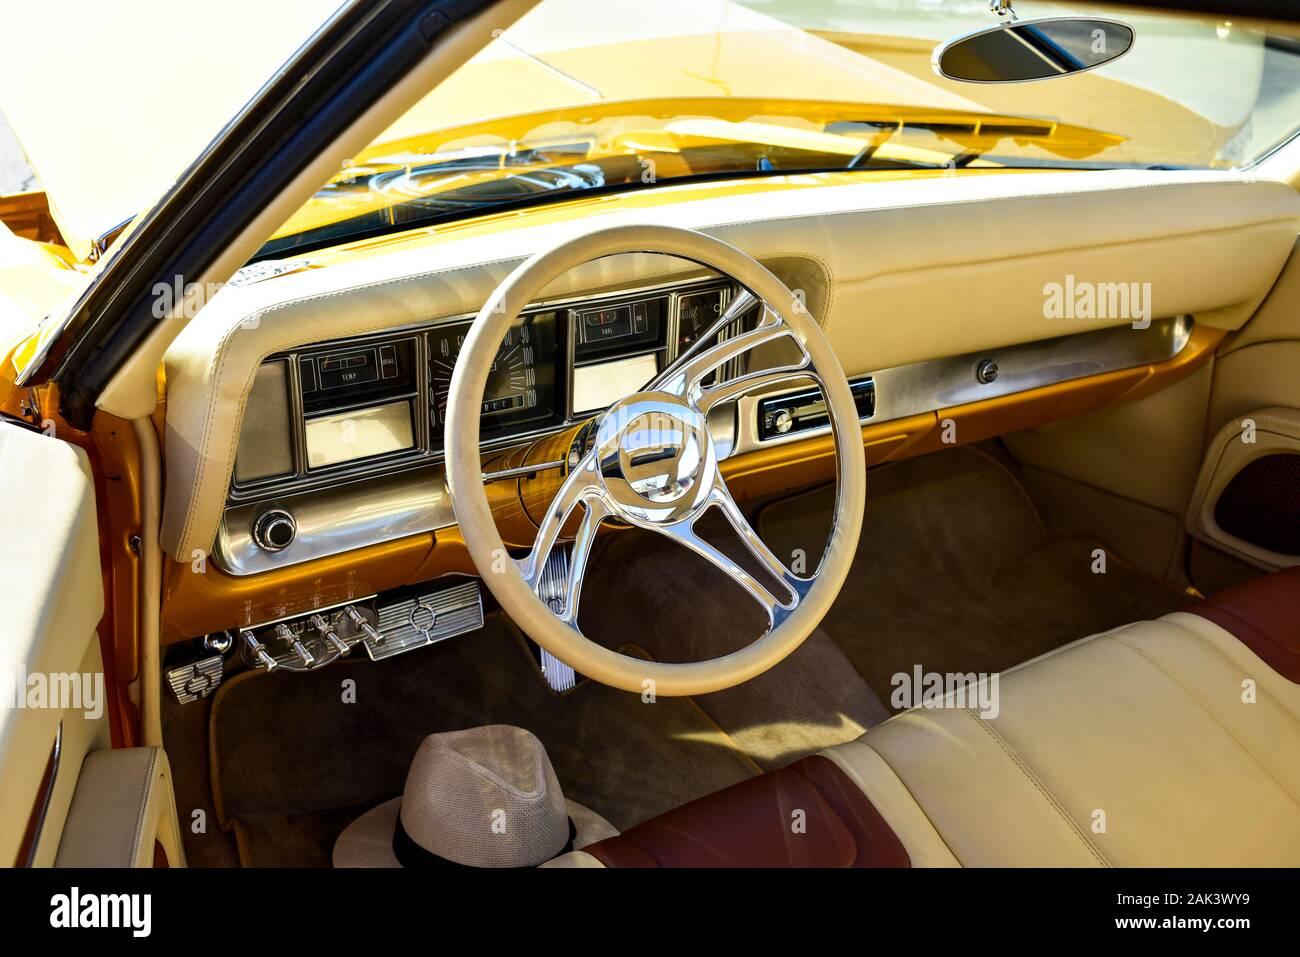 1969 Buick Riviera Interior Banque D'Images